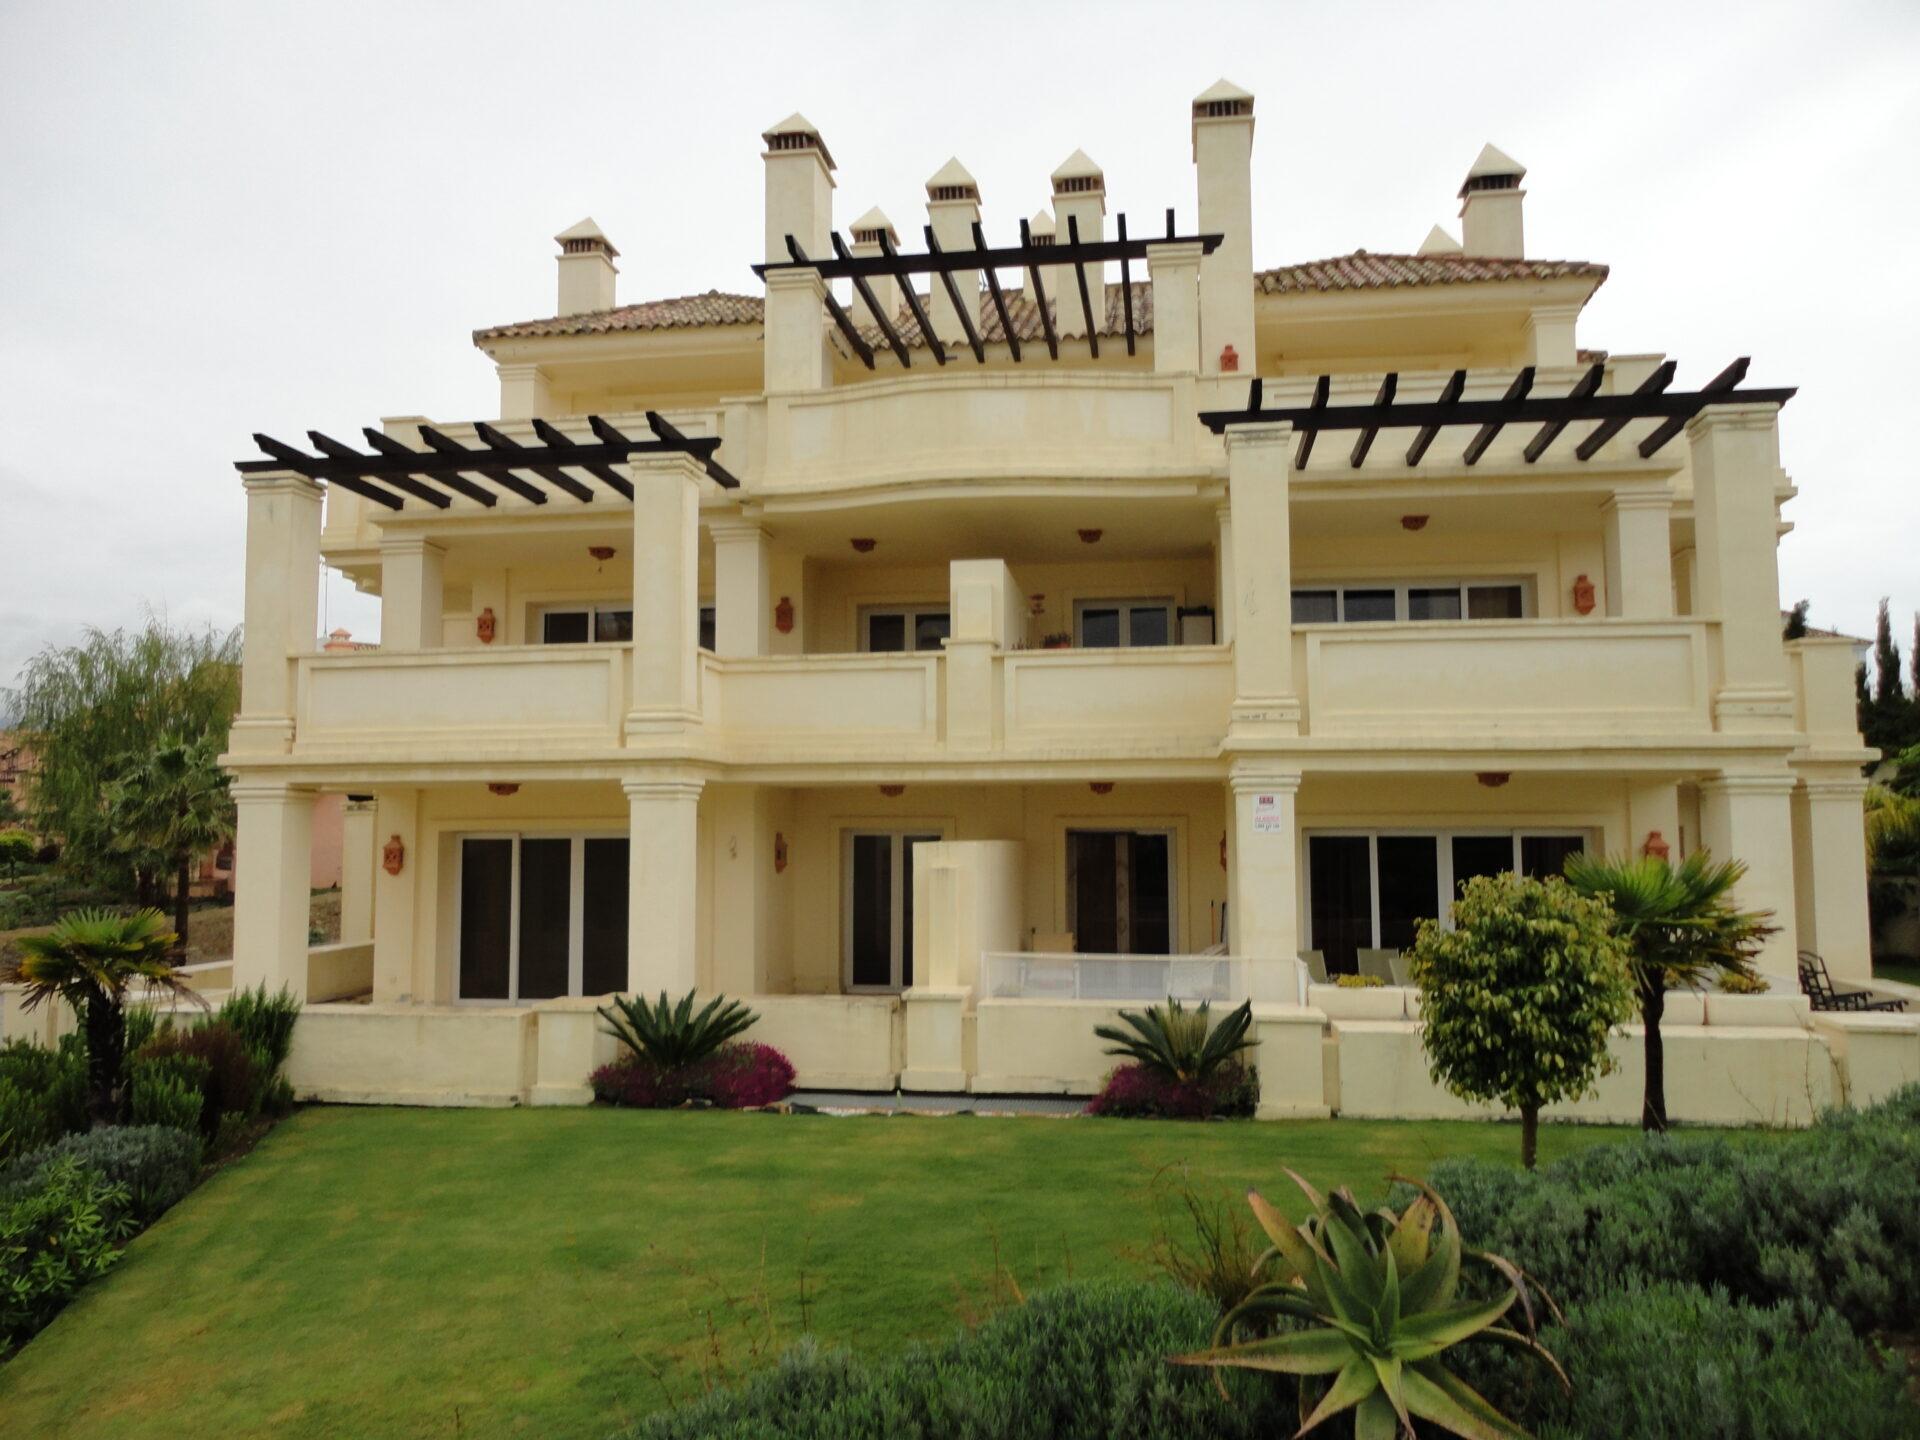 Buying real estate in Spain